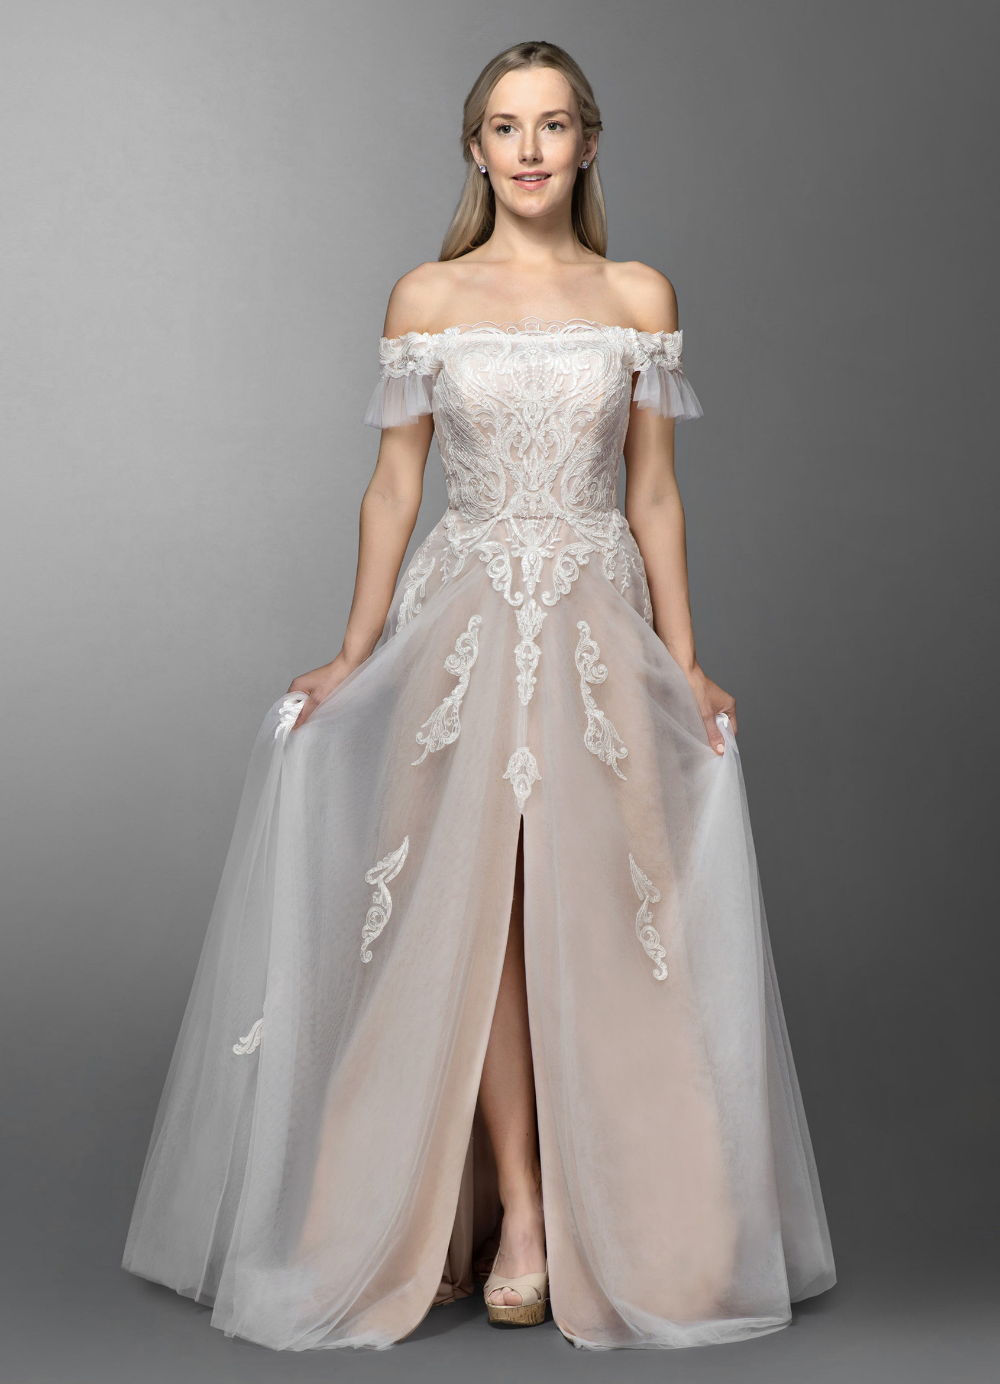 Azazie Lange BG Wedding Dress Diamond White/Champagne